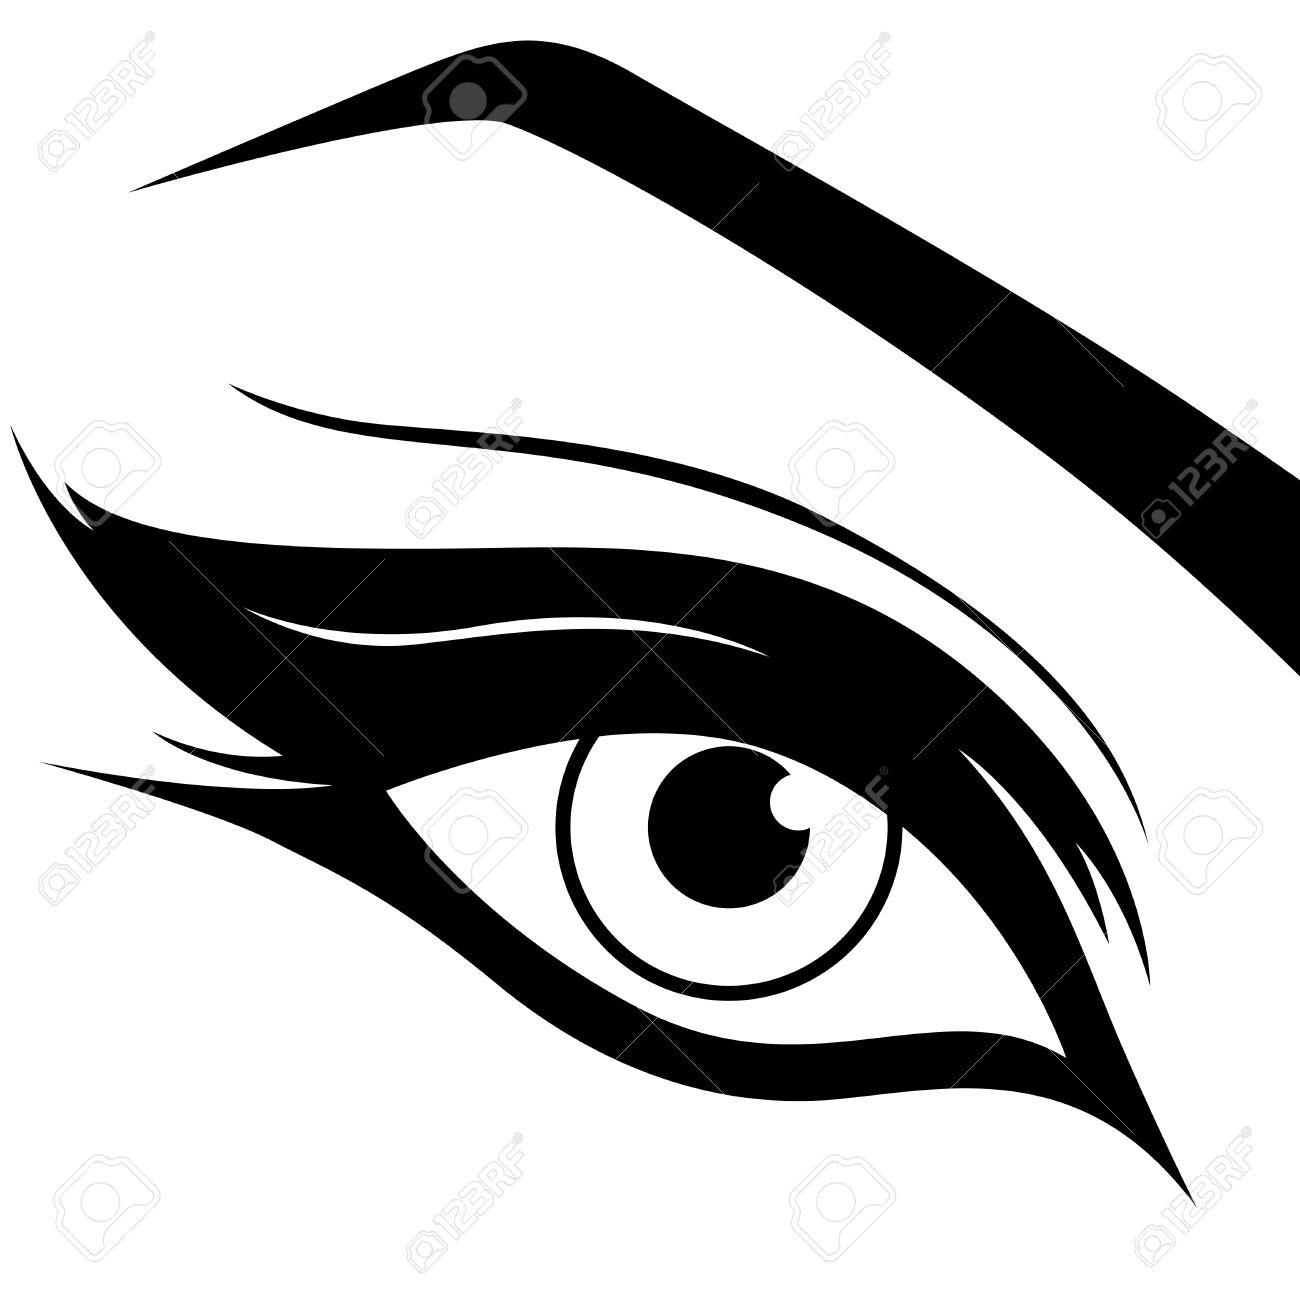 eye silhouette close up black and white hand drawing vector rh 123rf com vector eyeball vector eye chart